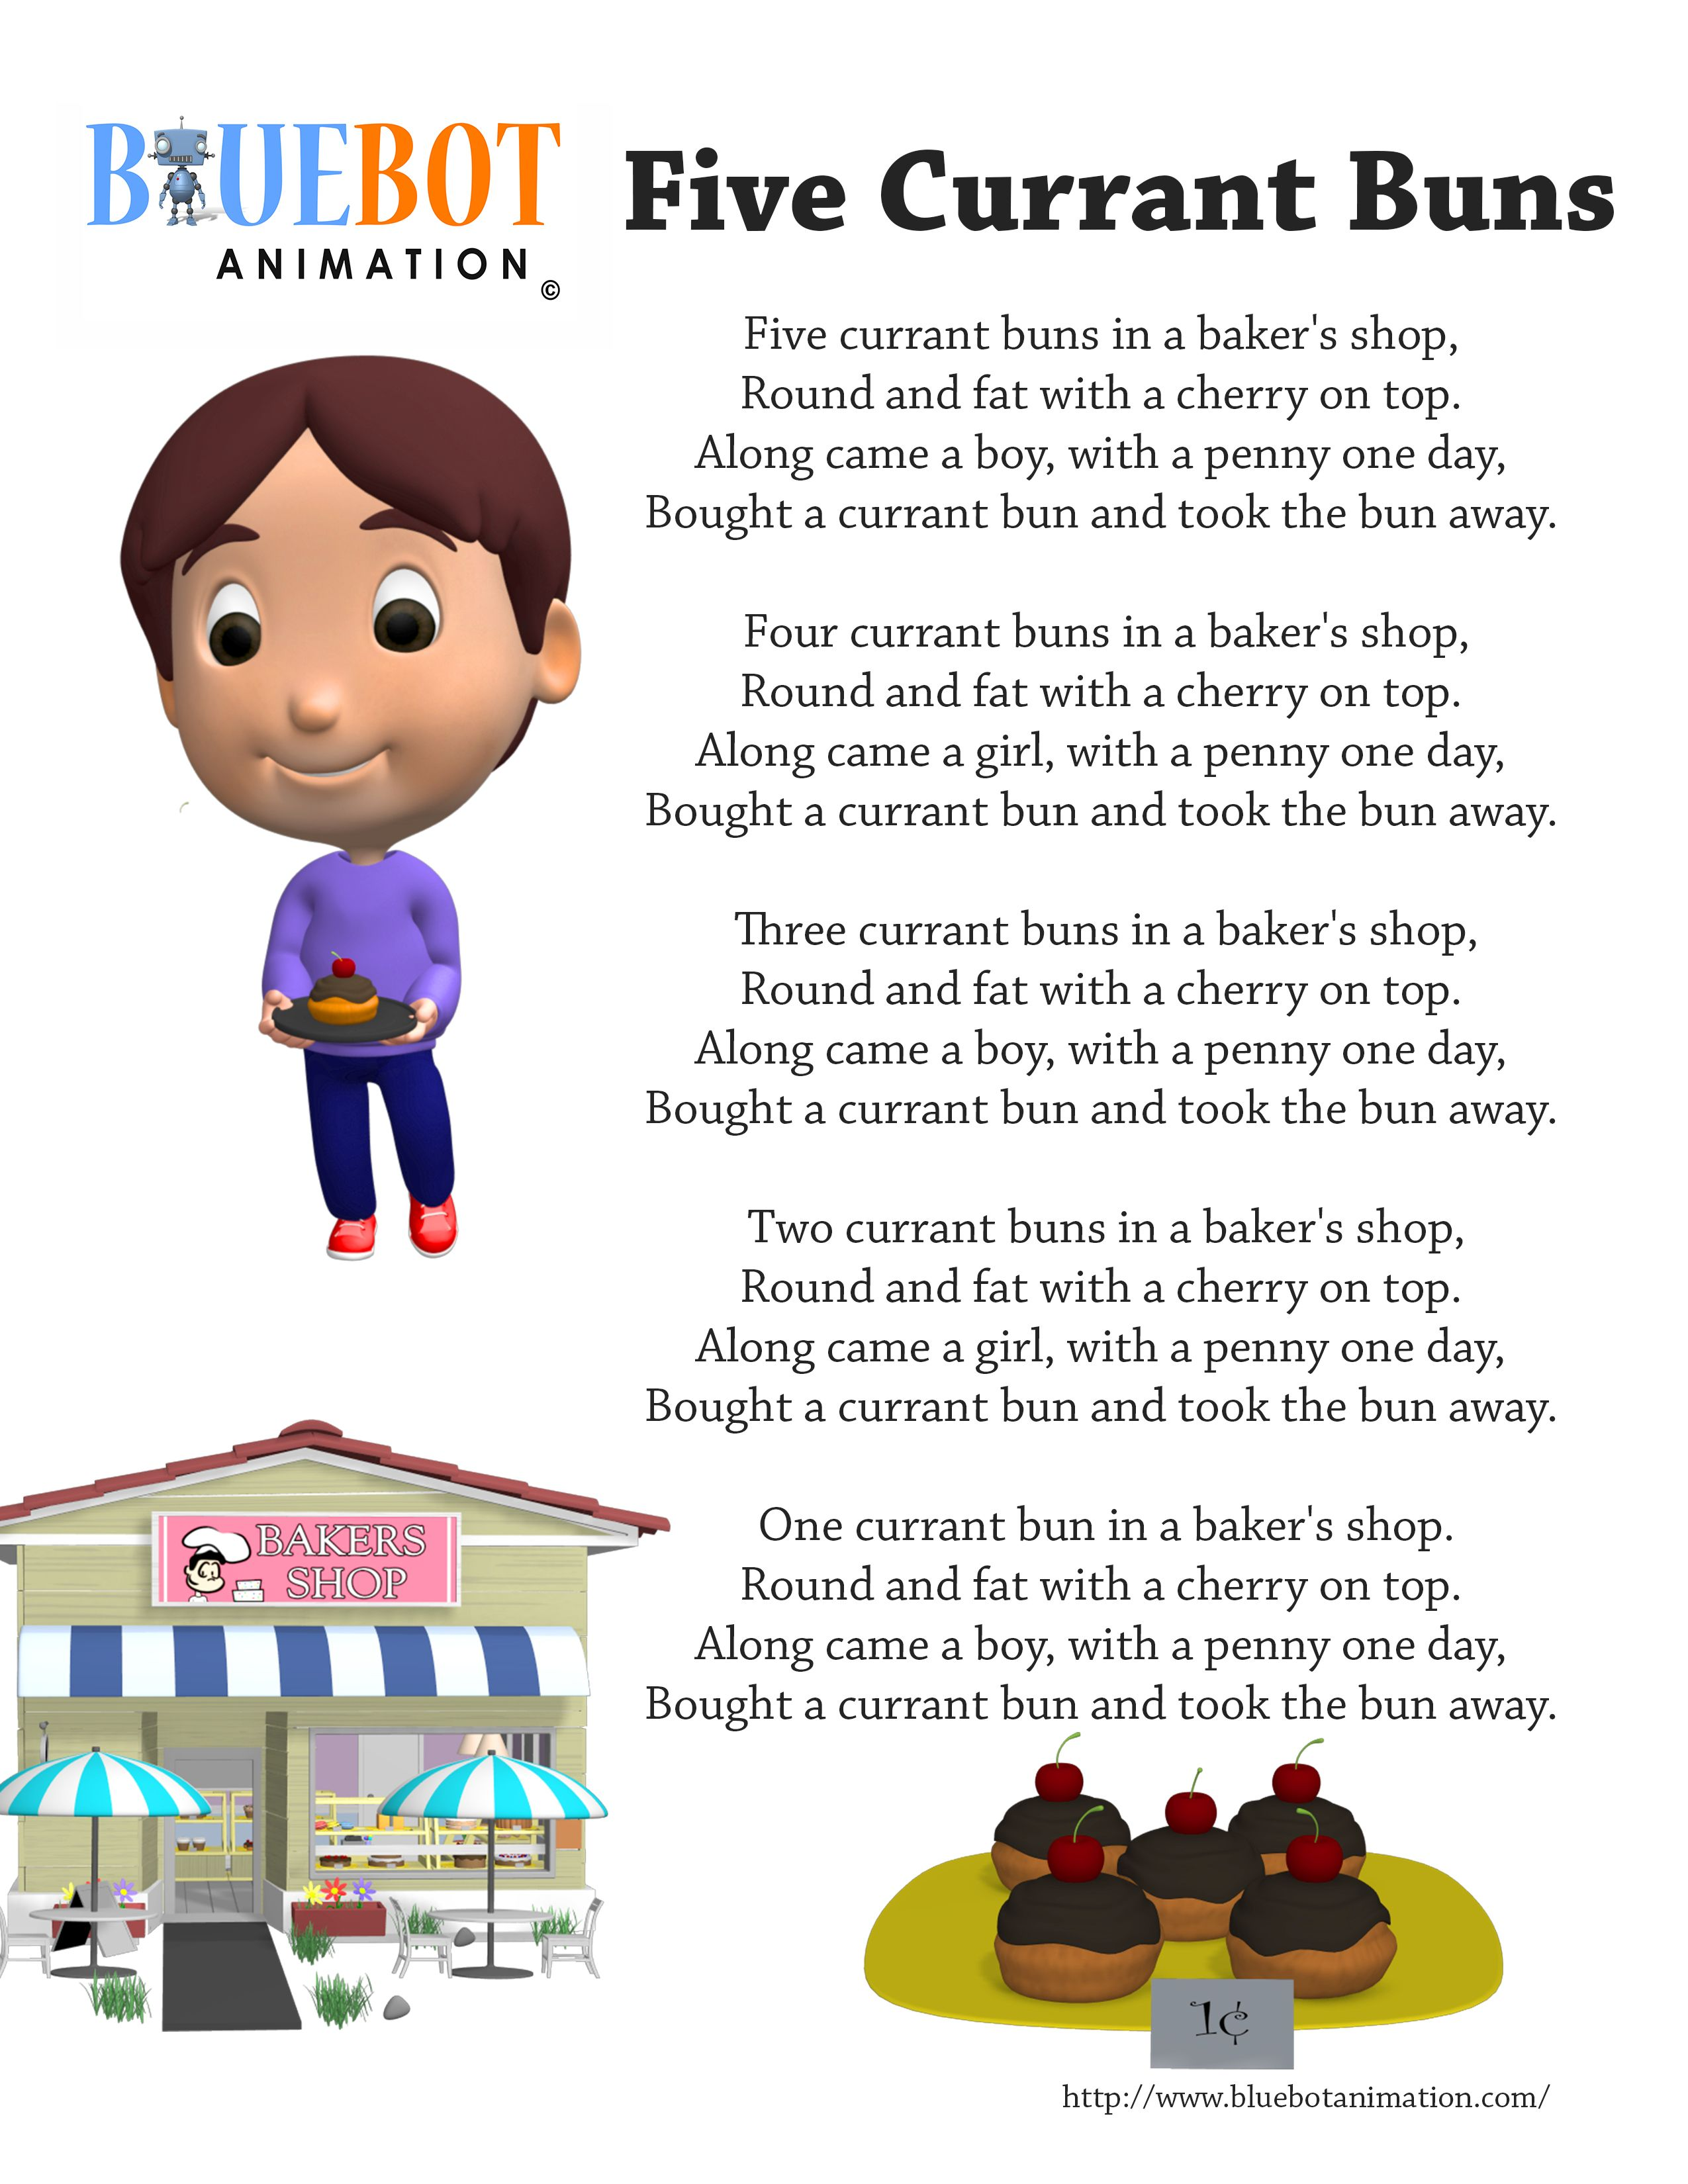 Five Currant Buns Nursery Rhyme Lyrics Free Printable